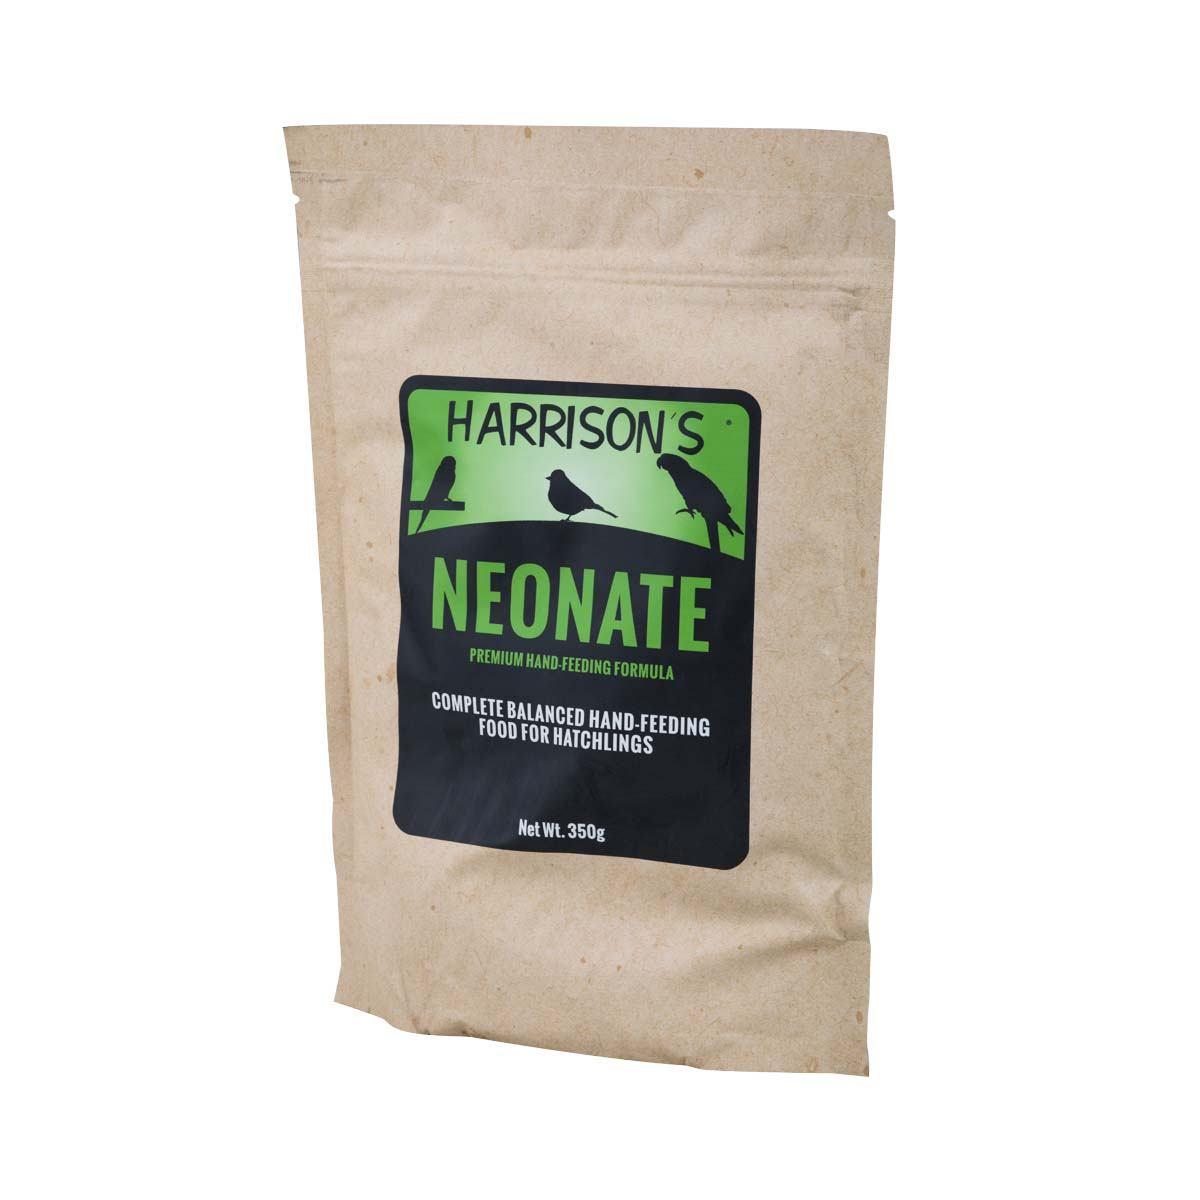 Harrison's Neonate Premium